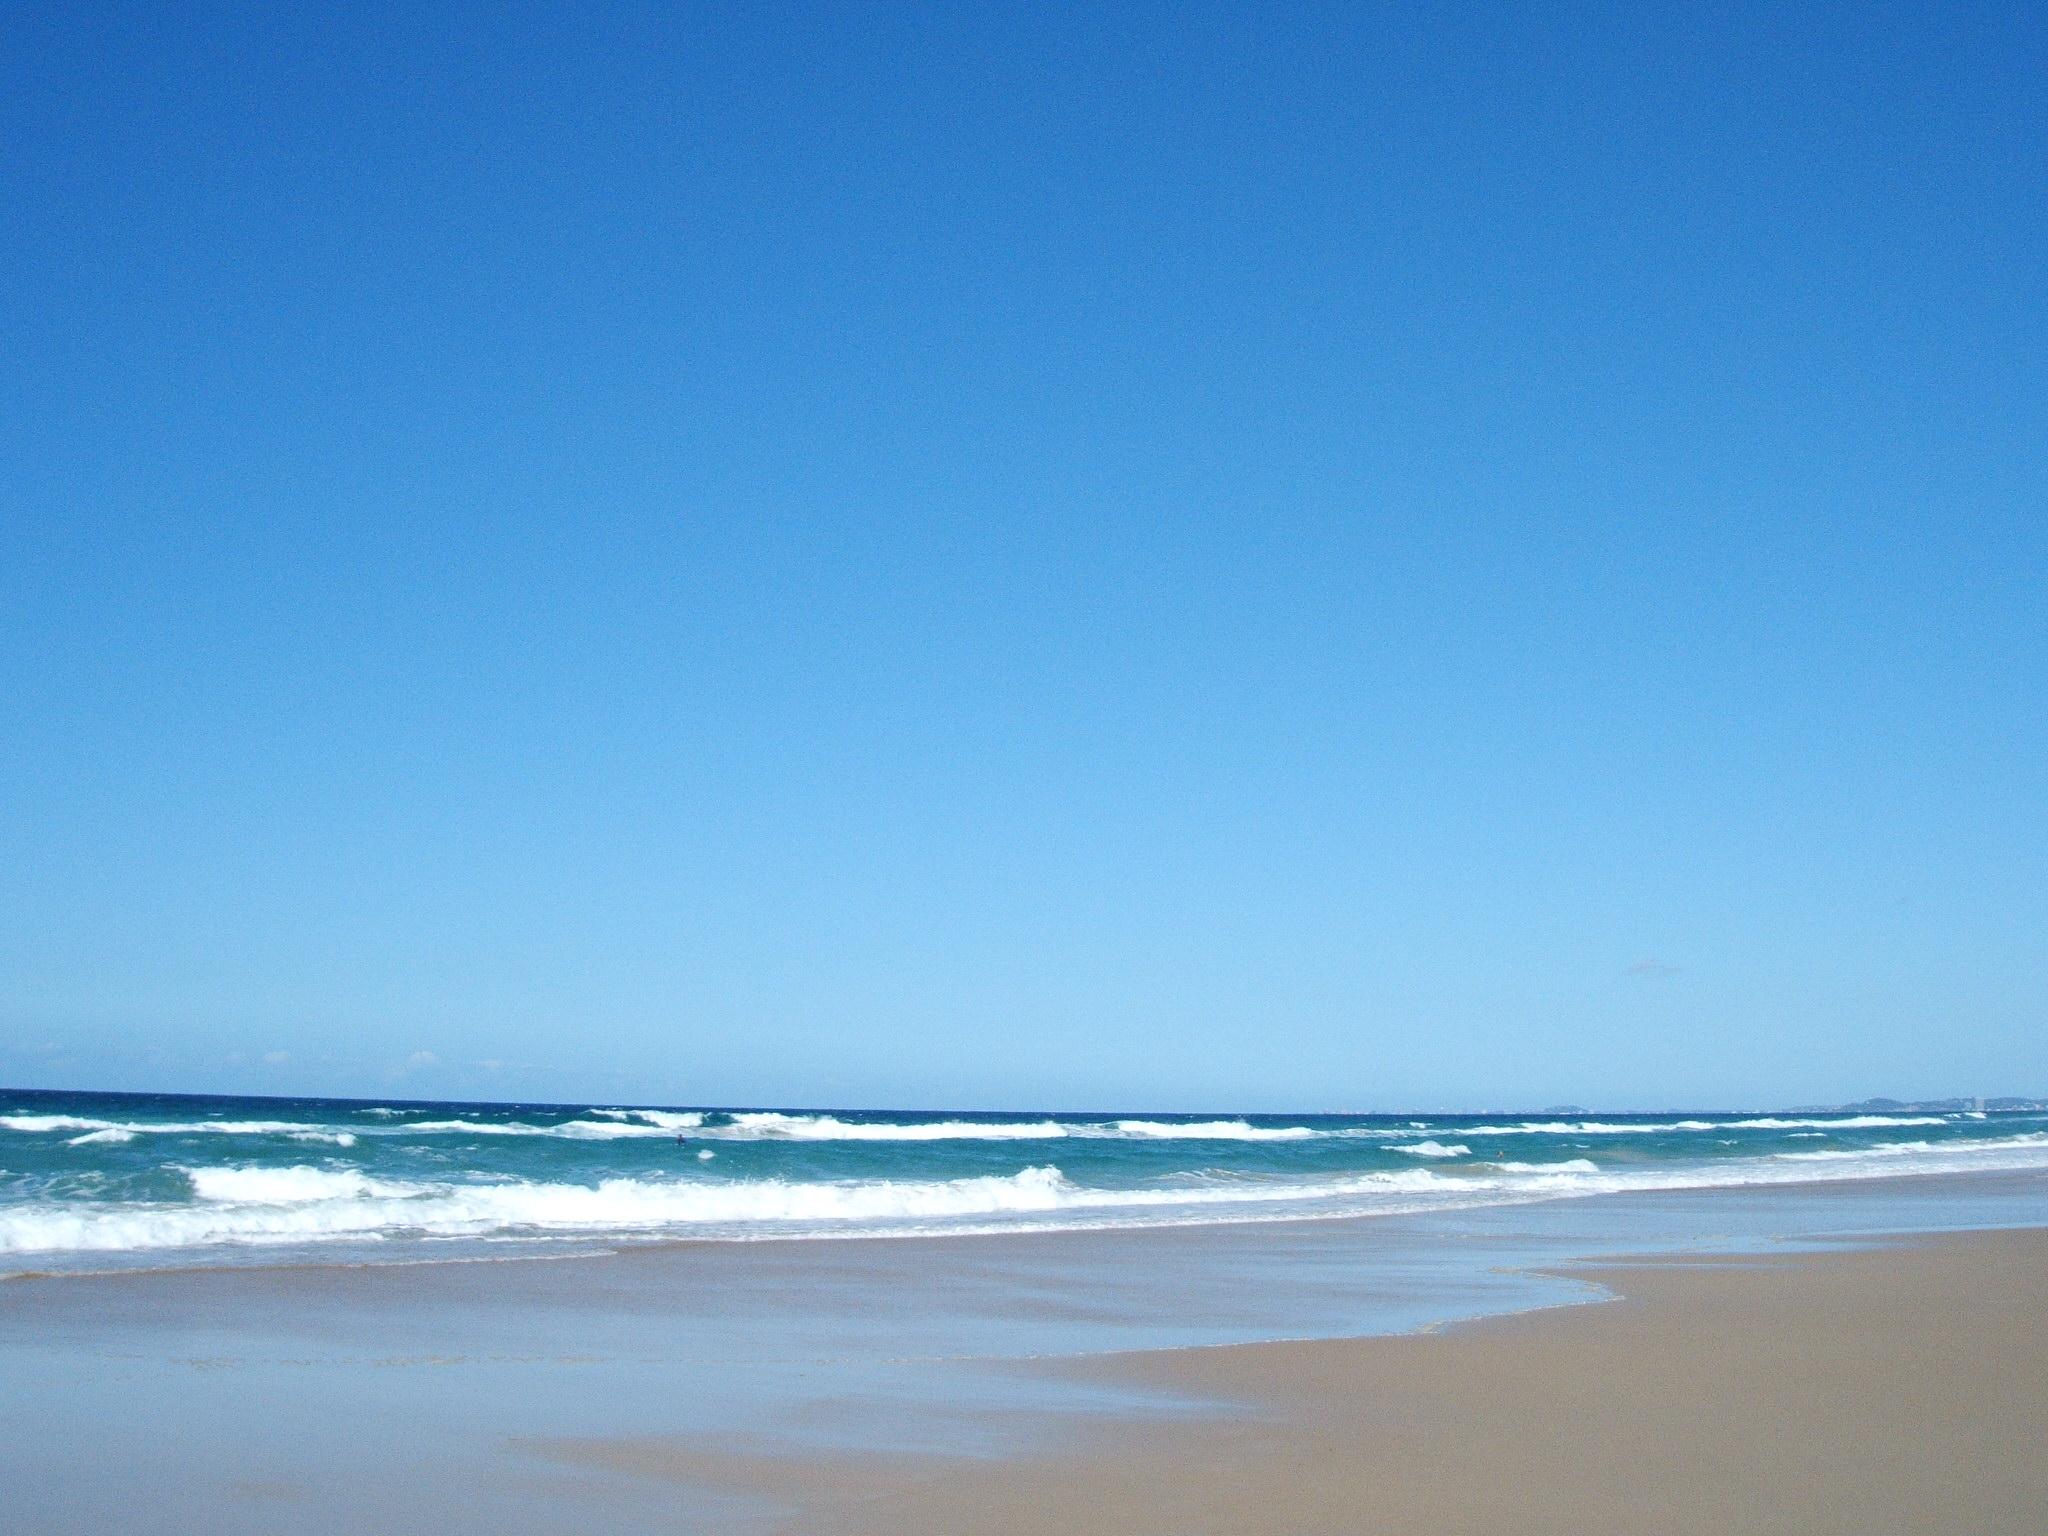 The coastline photo